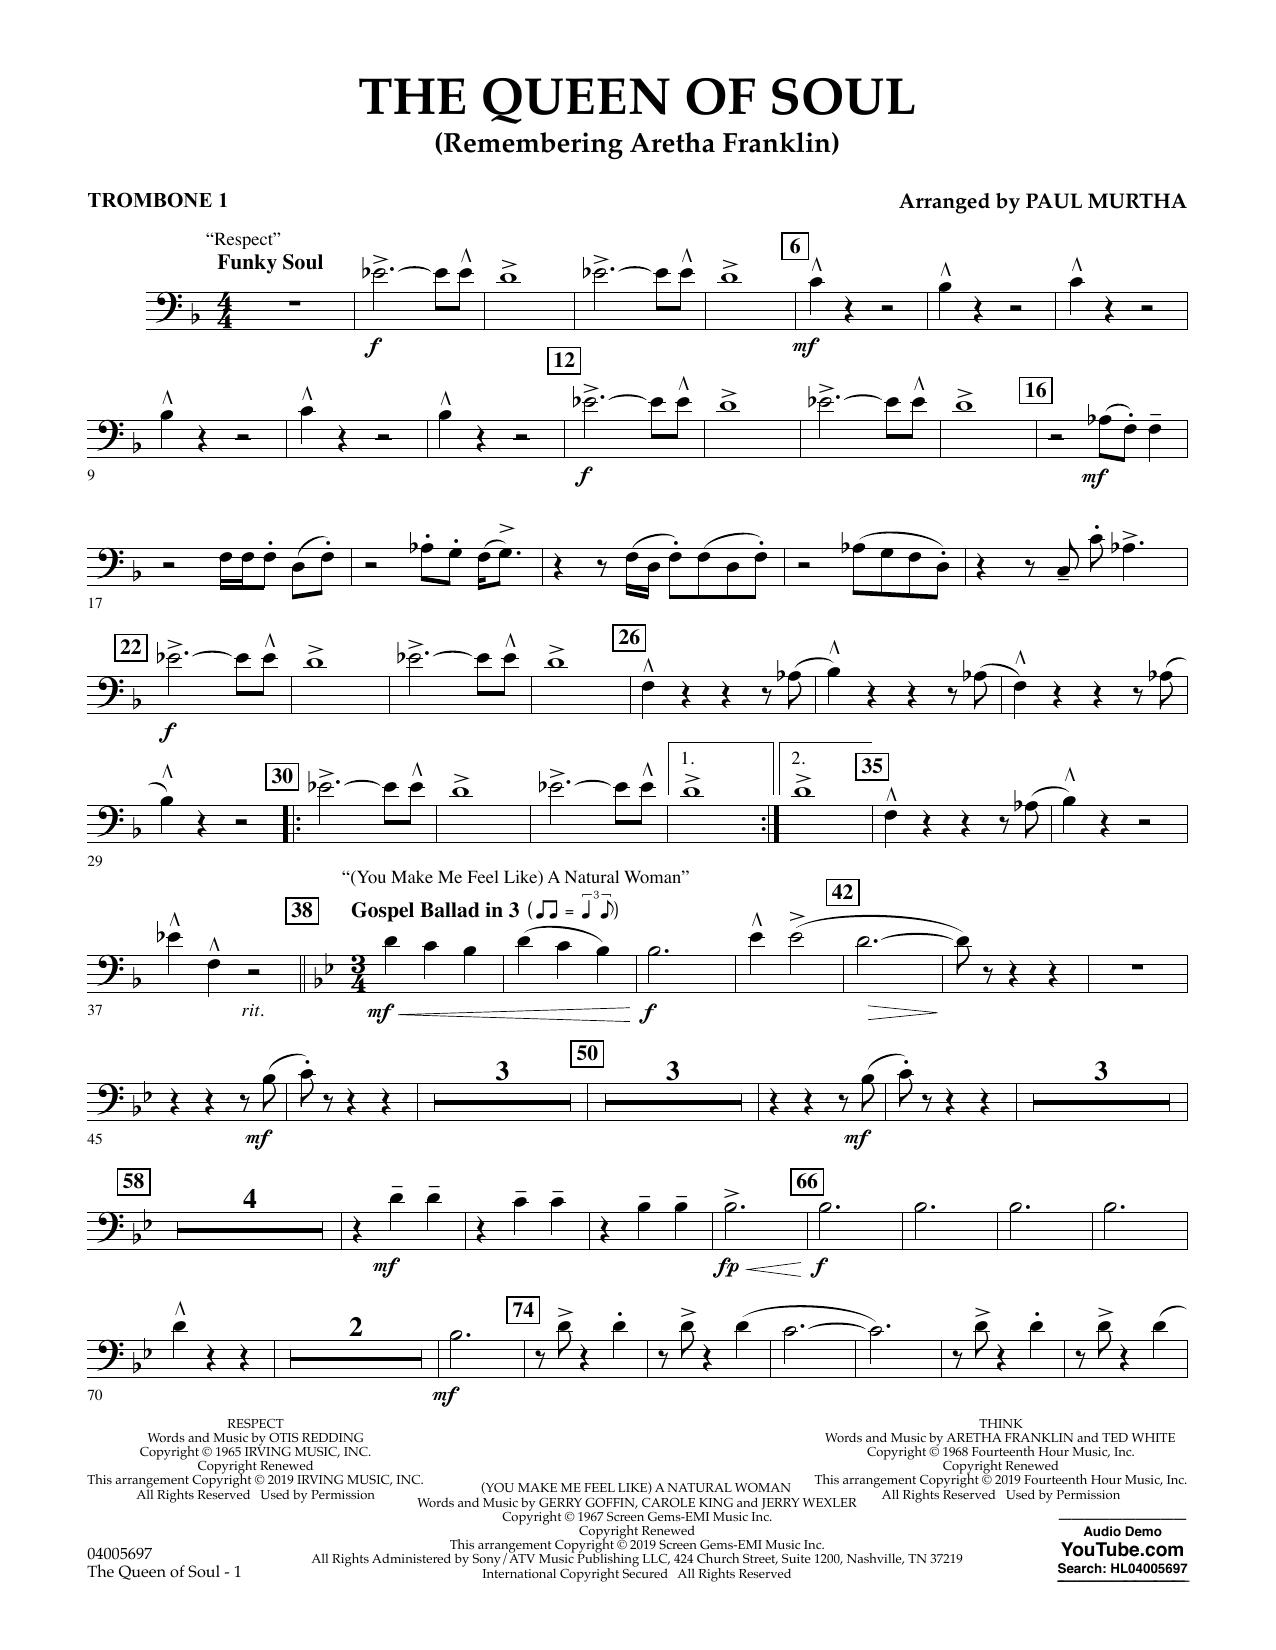 The Queen Of Soul (arr. Paul Murtha)- Conductor Score (Full Score) - Trombone 1 (Concert Band)